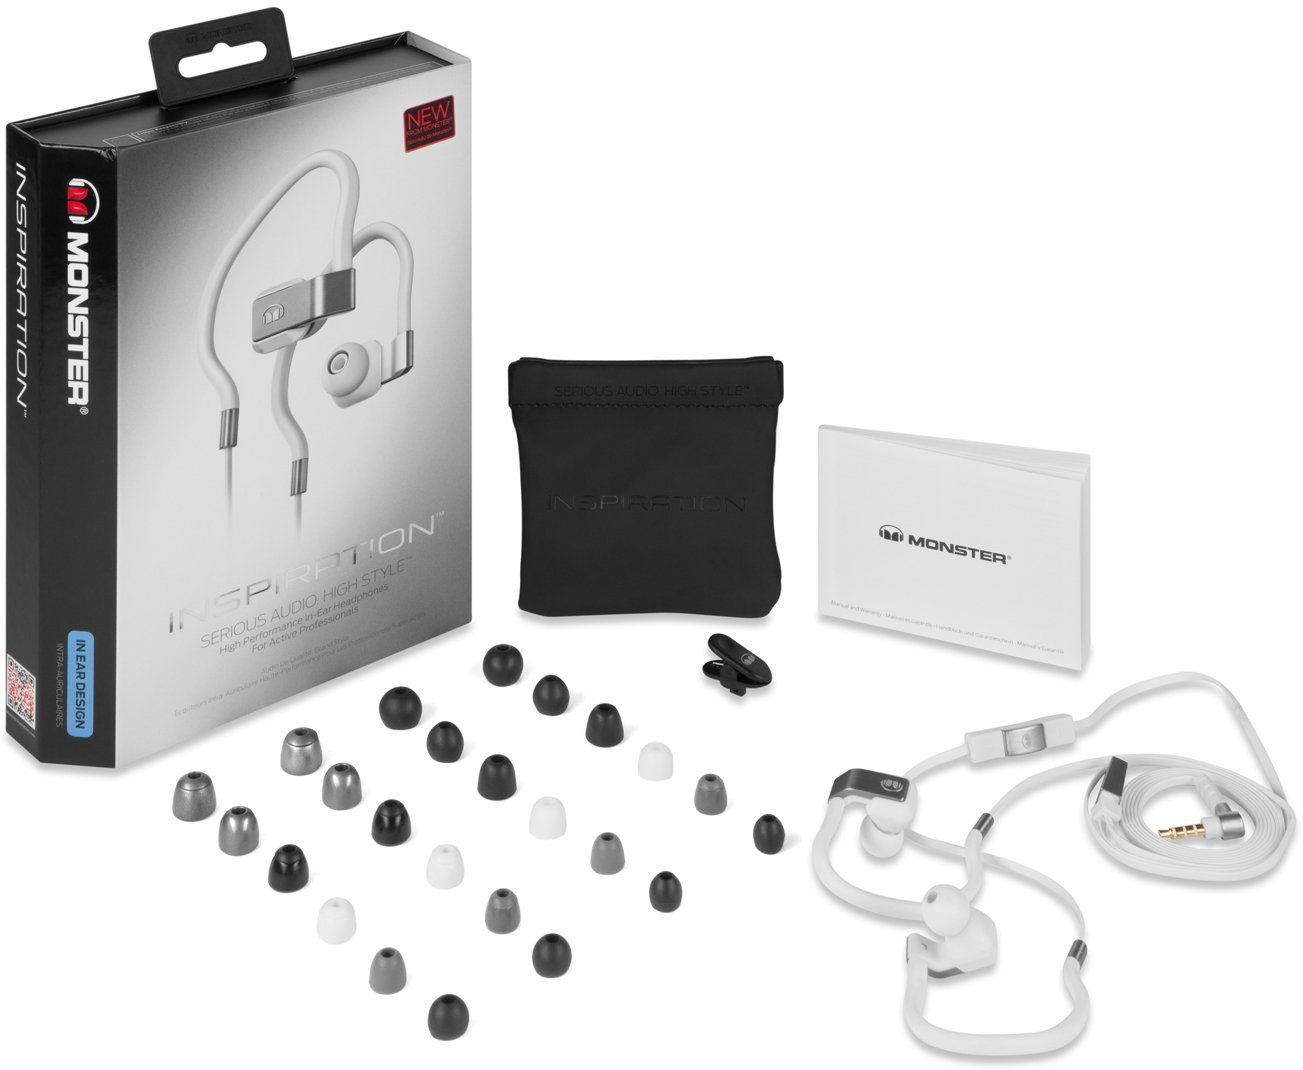 monster inspiration bruit isolation en oreille casque t te t l phones avec micro ebay. Black Bedroom Furniture Sets. Home Design Ideas